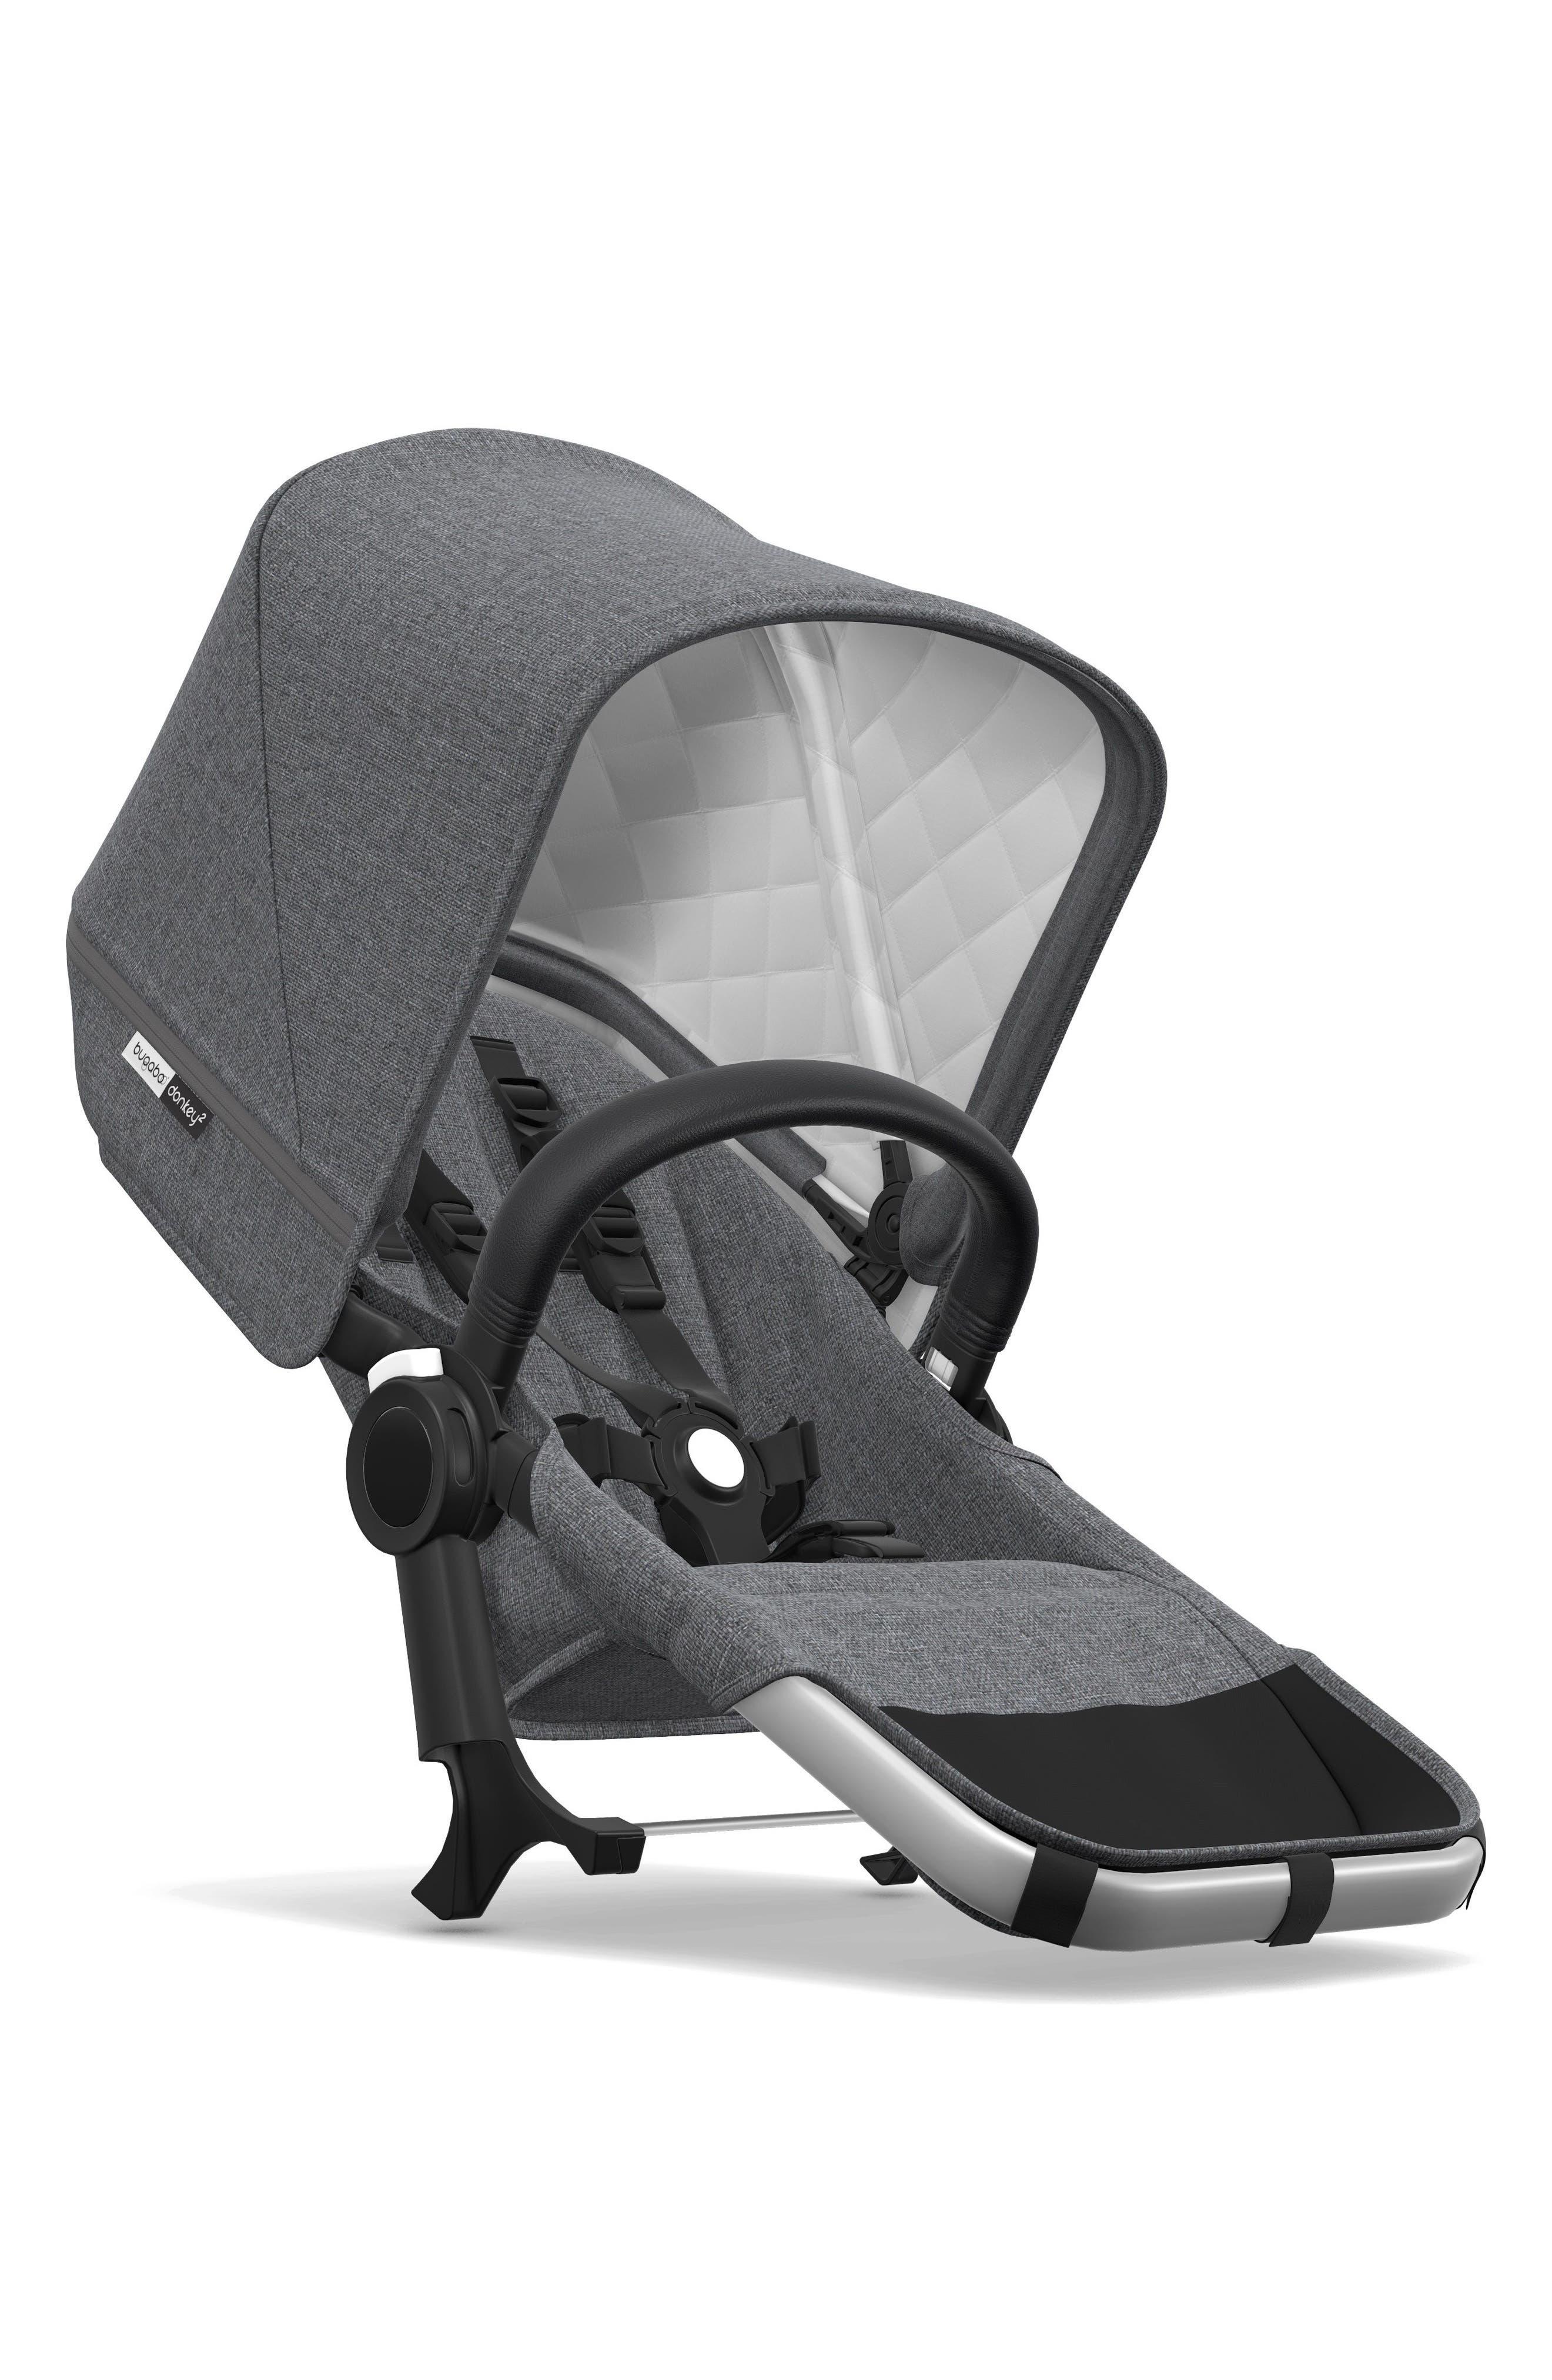 BUGABOO,                             Frame Seat Extension for Donkey2 Stroller,                             Main thumbnail 1, color,                             GREY MELANGE/ ALUMINUM